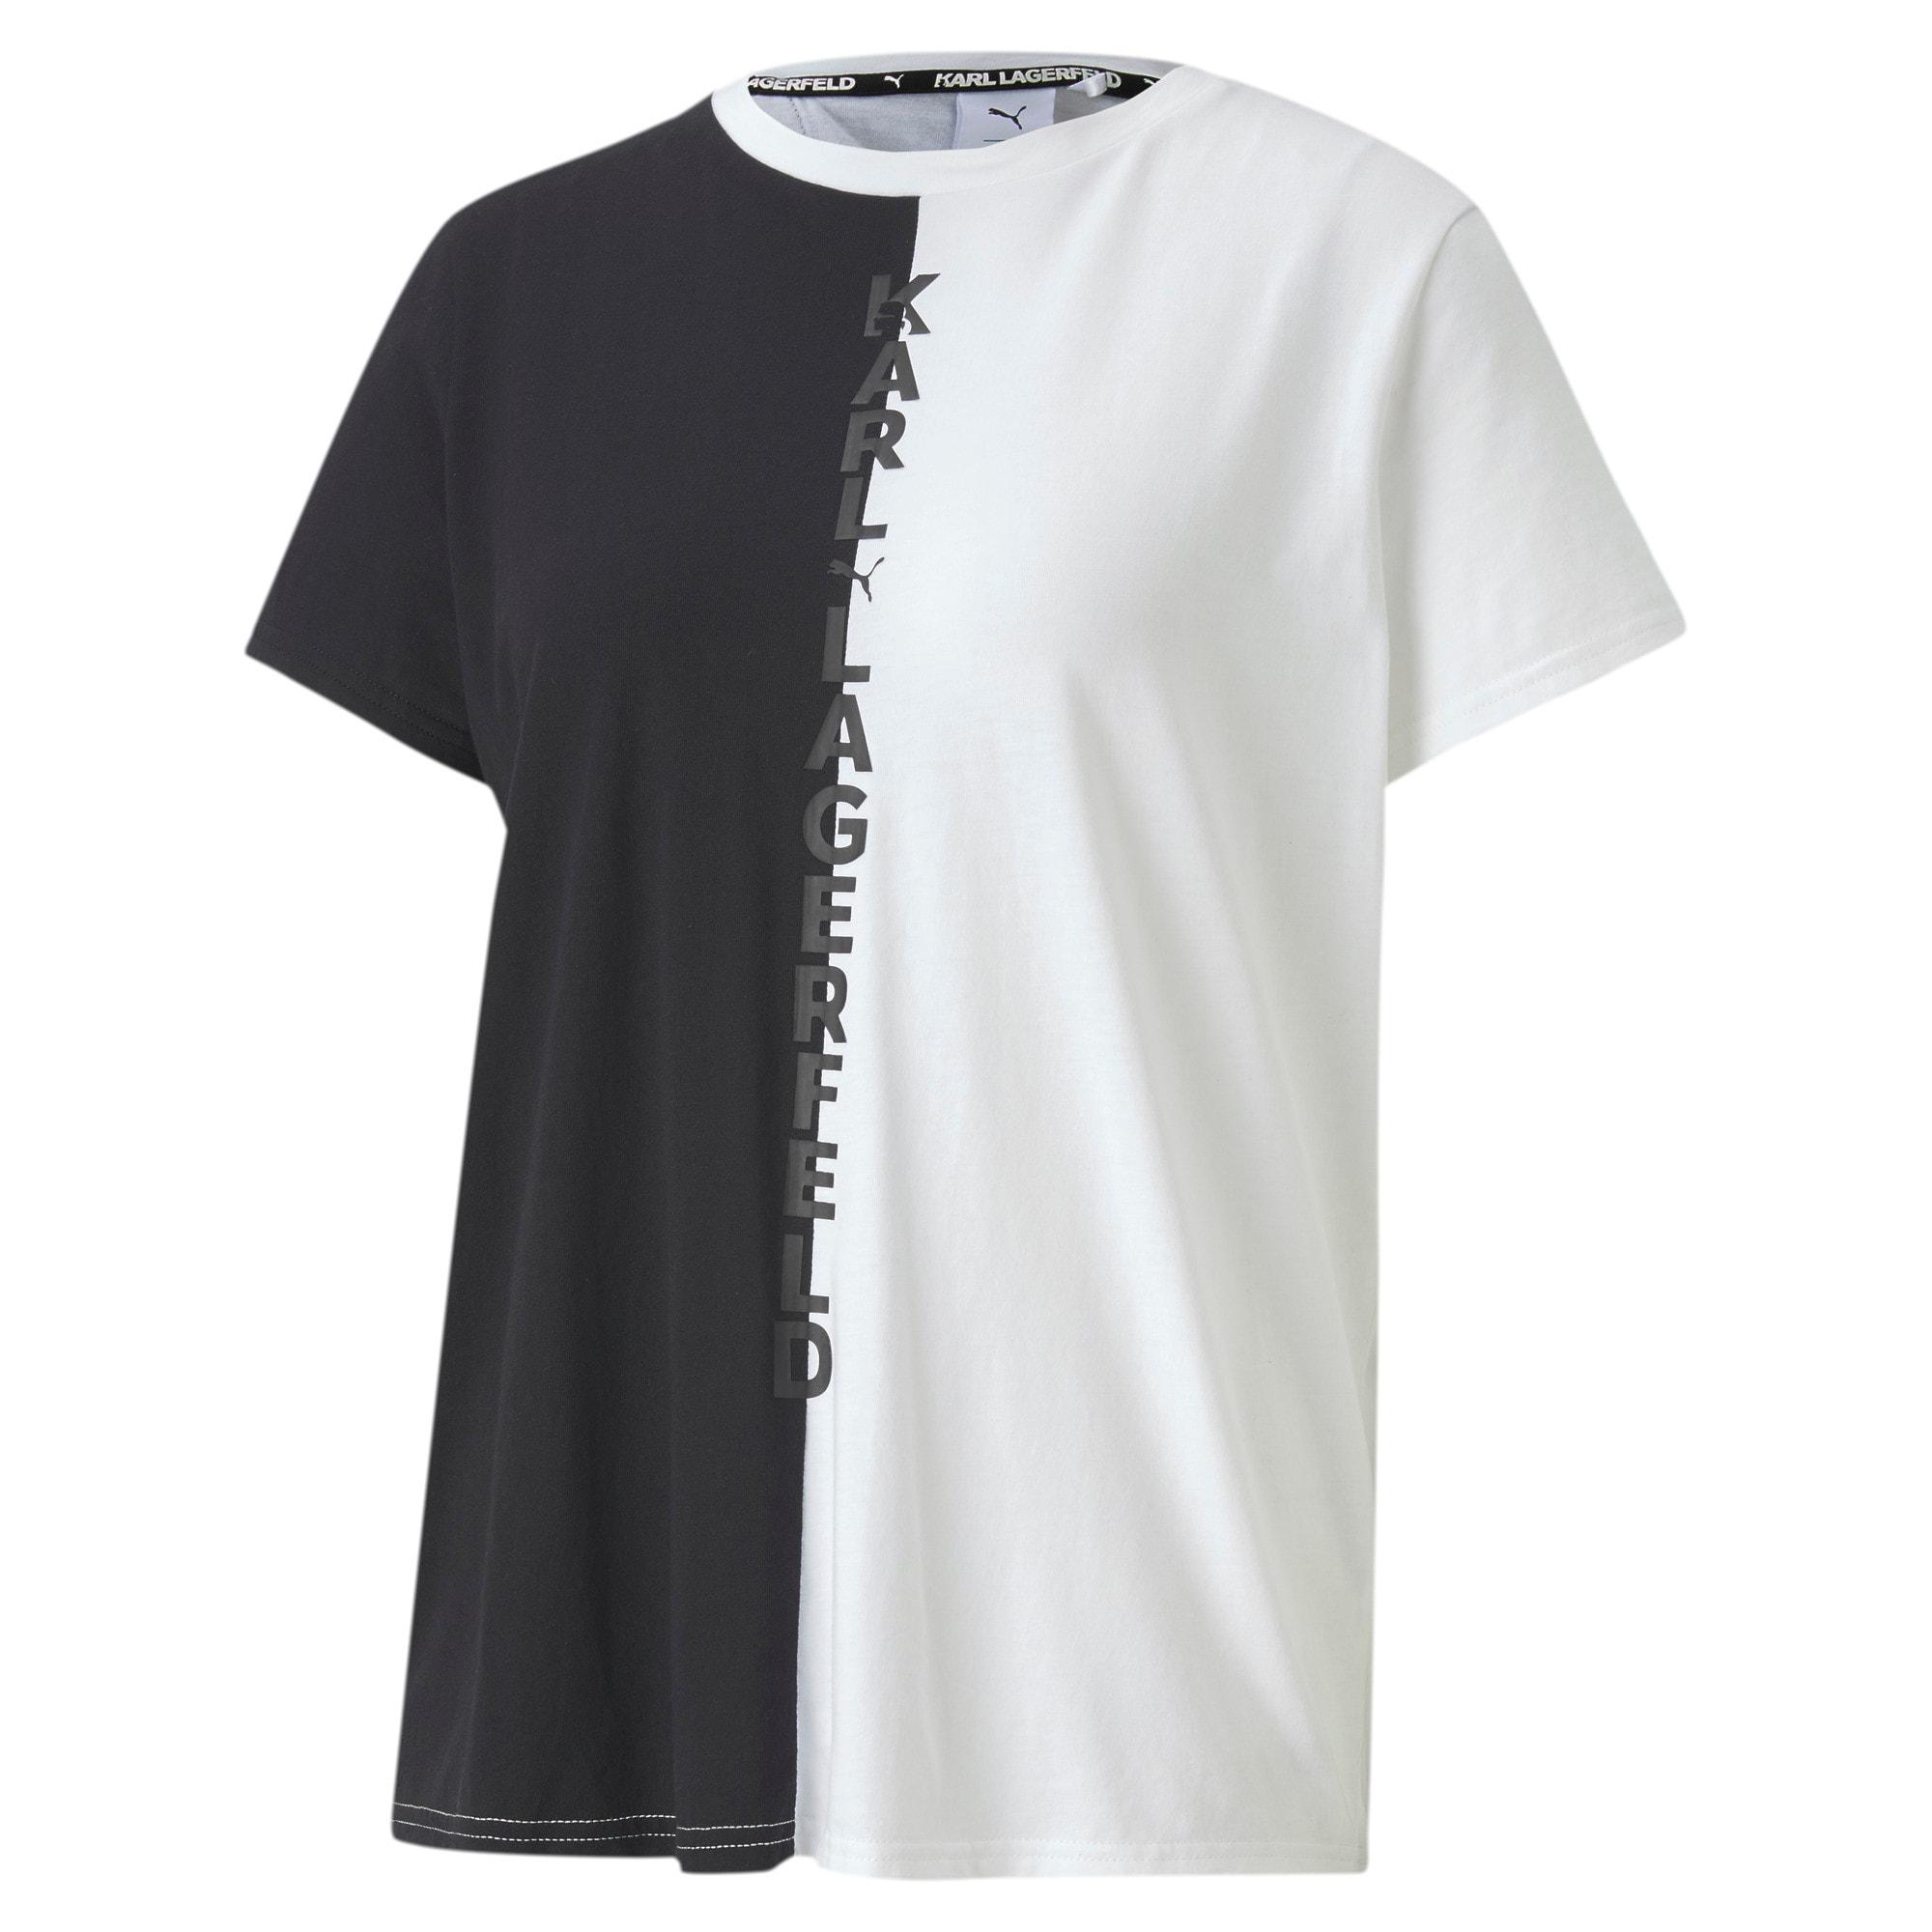 Miniatura 1 de Camiseta de espalda abierta PUMA x KARL LAGERFELD para mujer, Puma Black, mediano